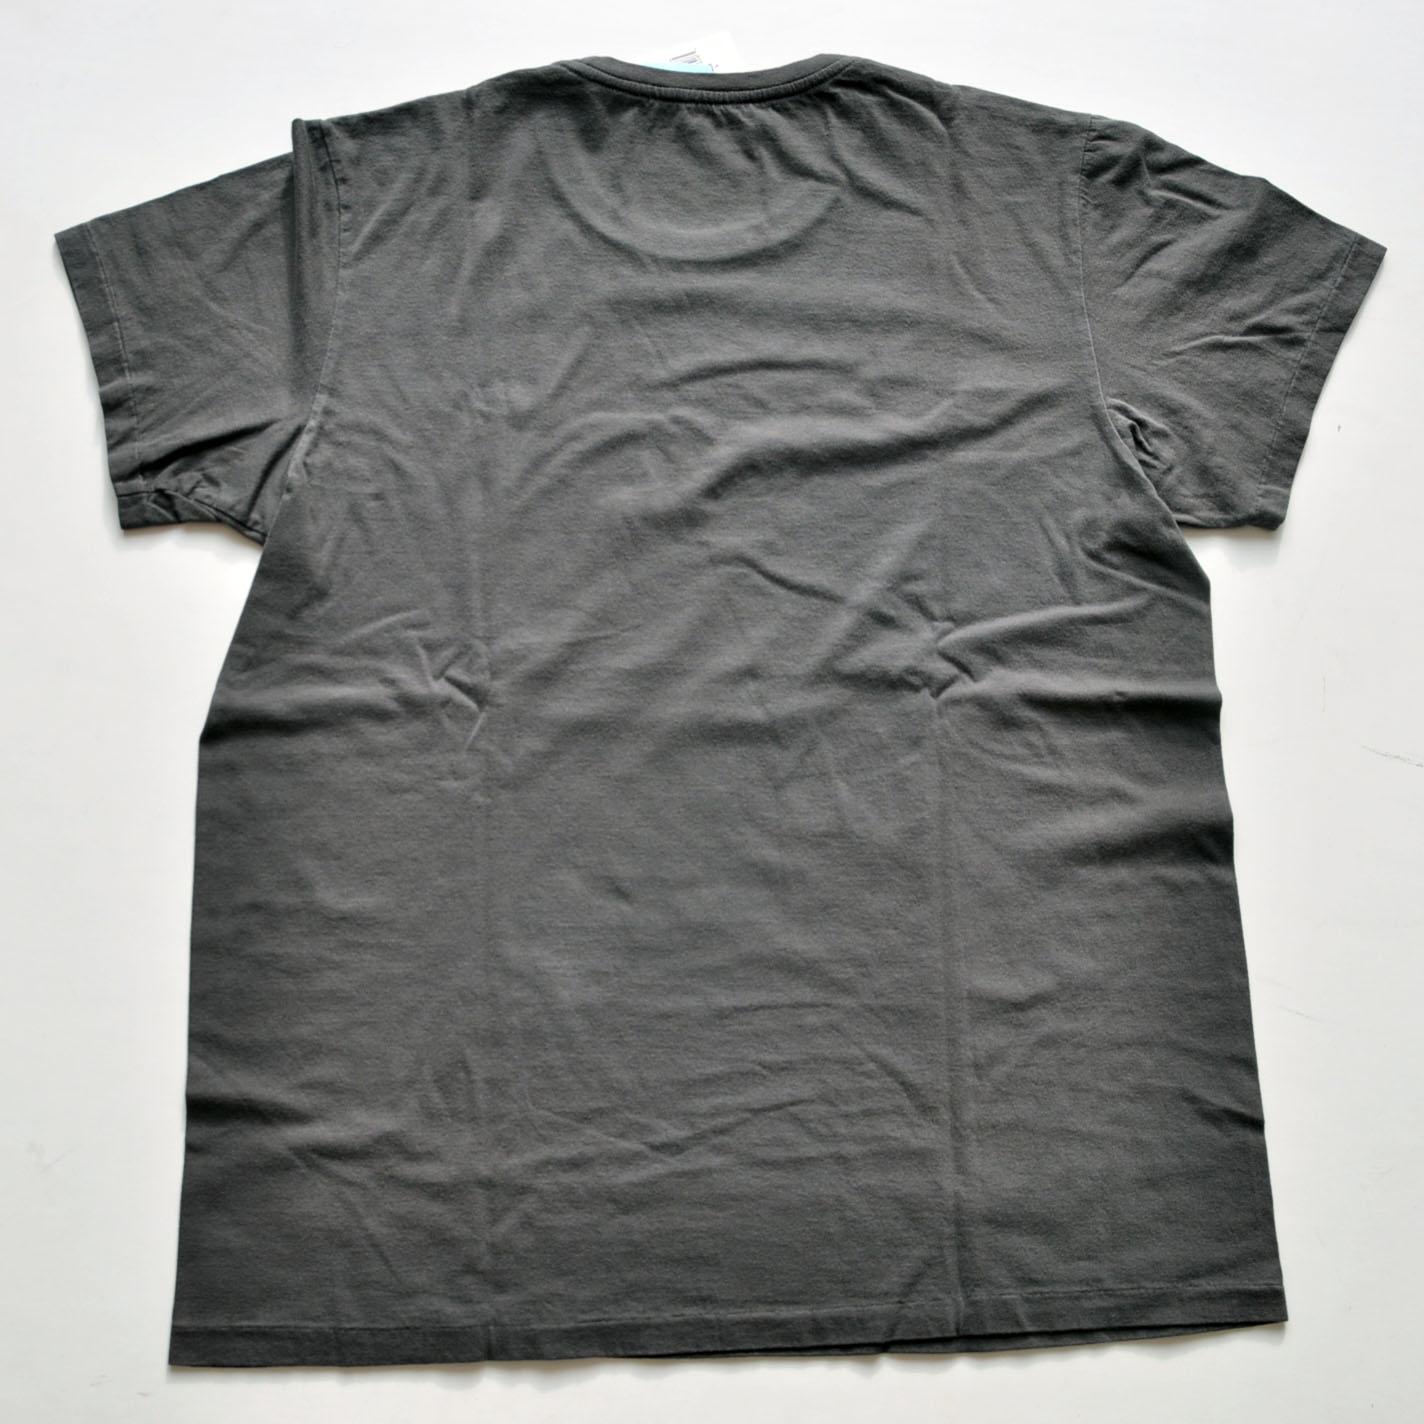 RRL/ダブルアールエル 半袖フロントロゴTシャツ チャコールグレー BIG SIZE-2